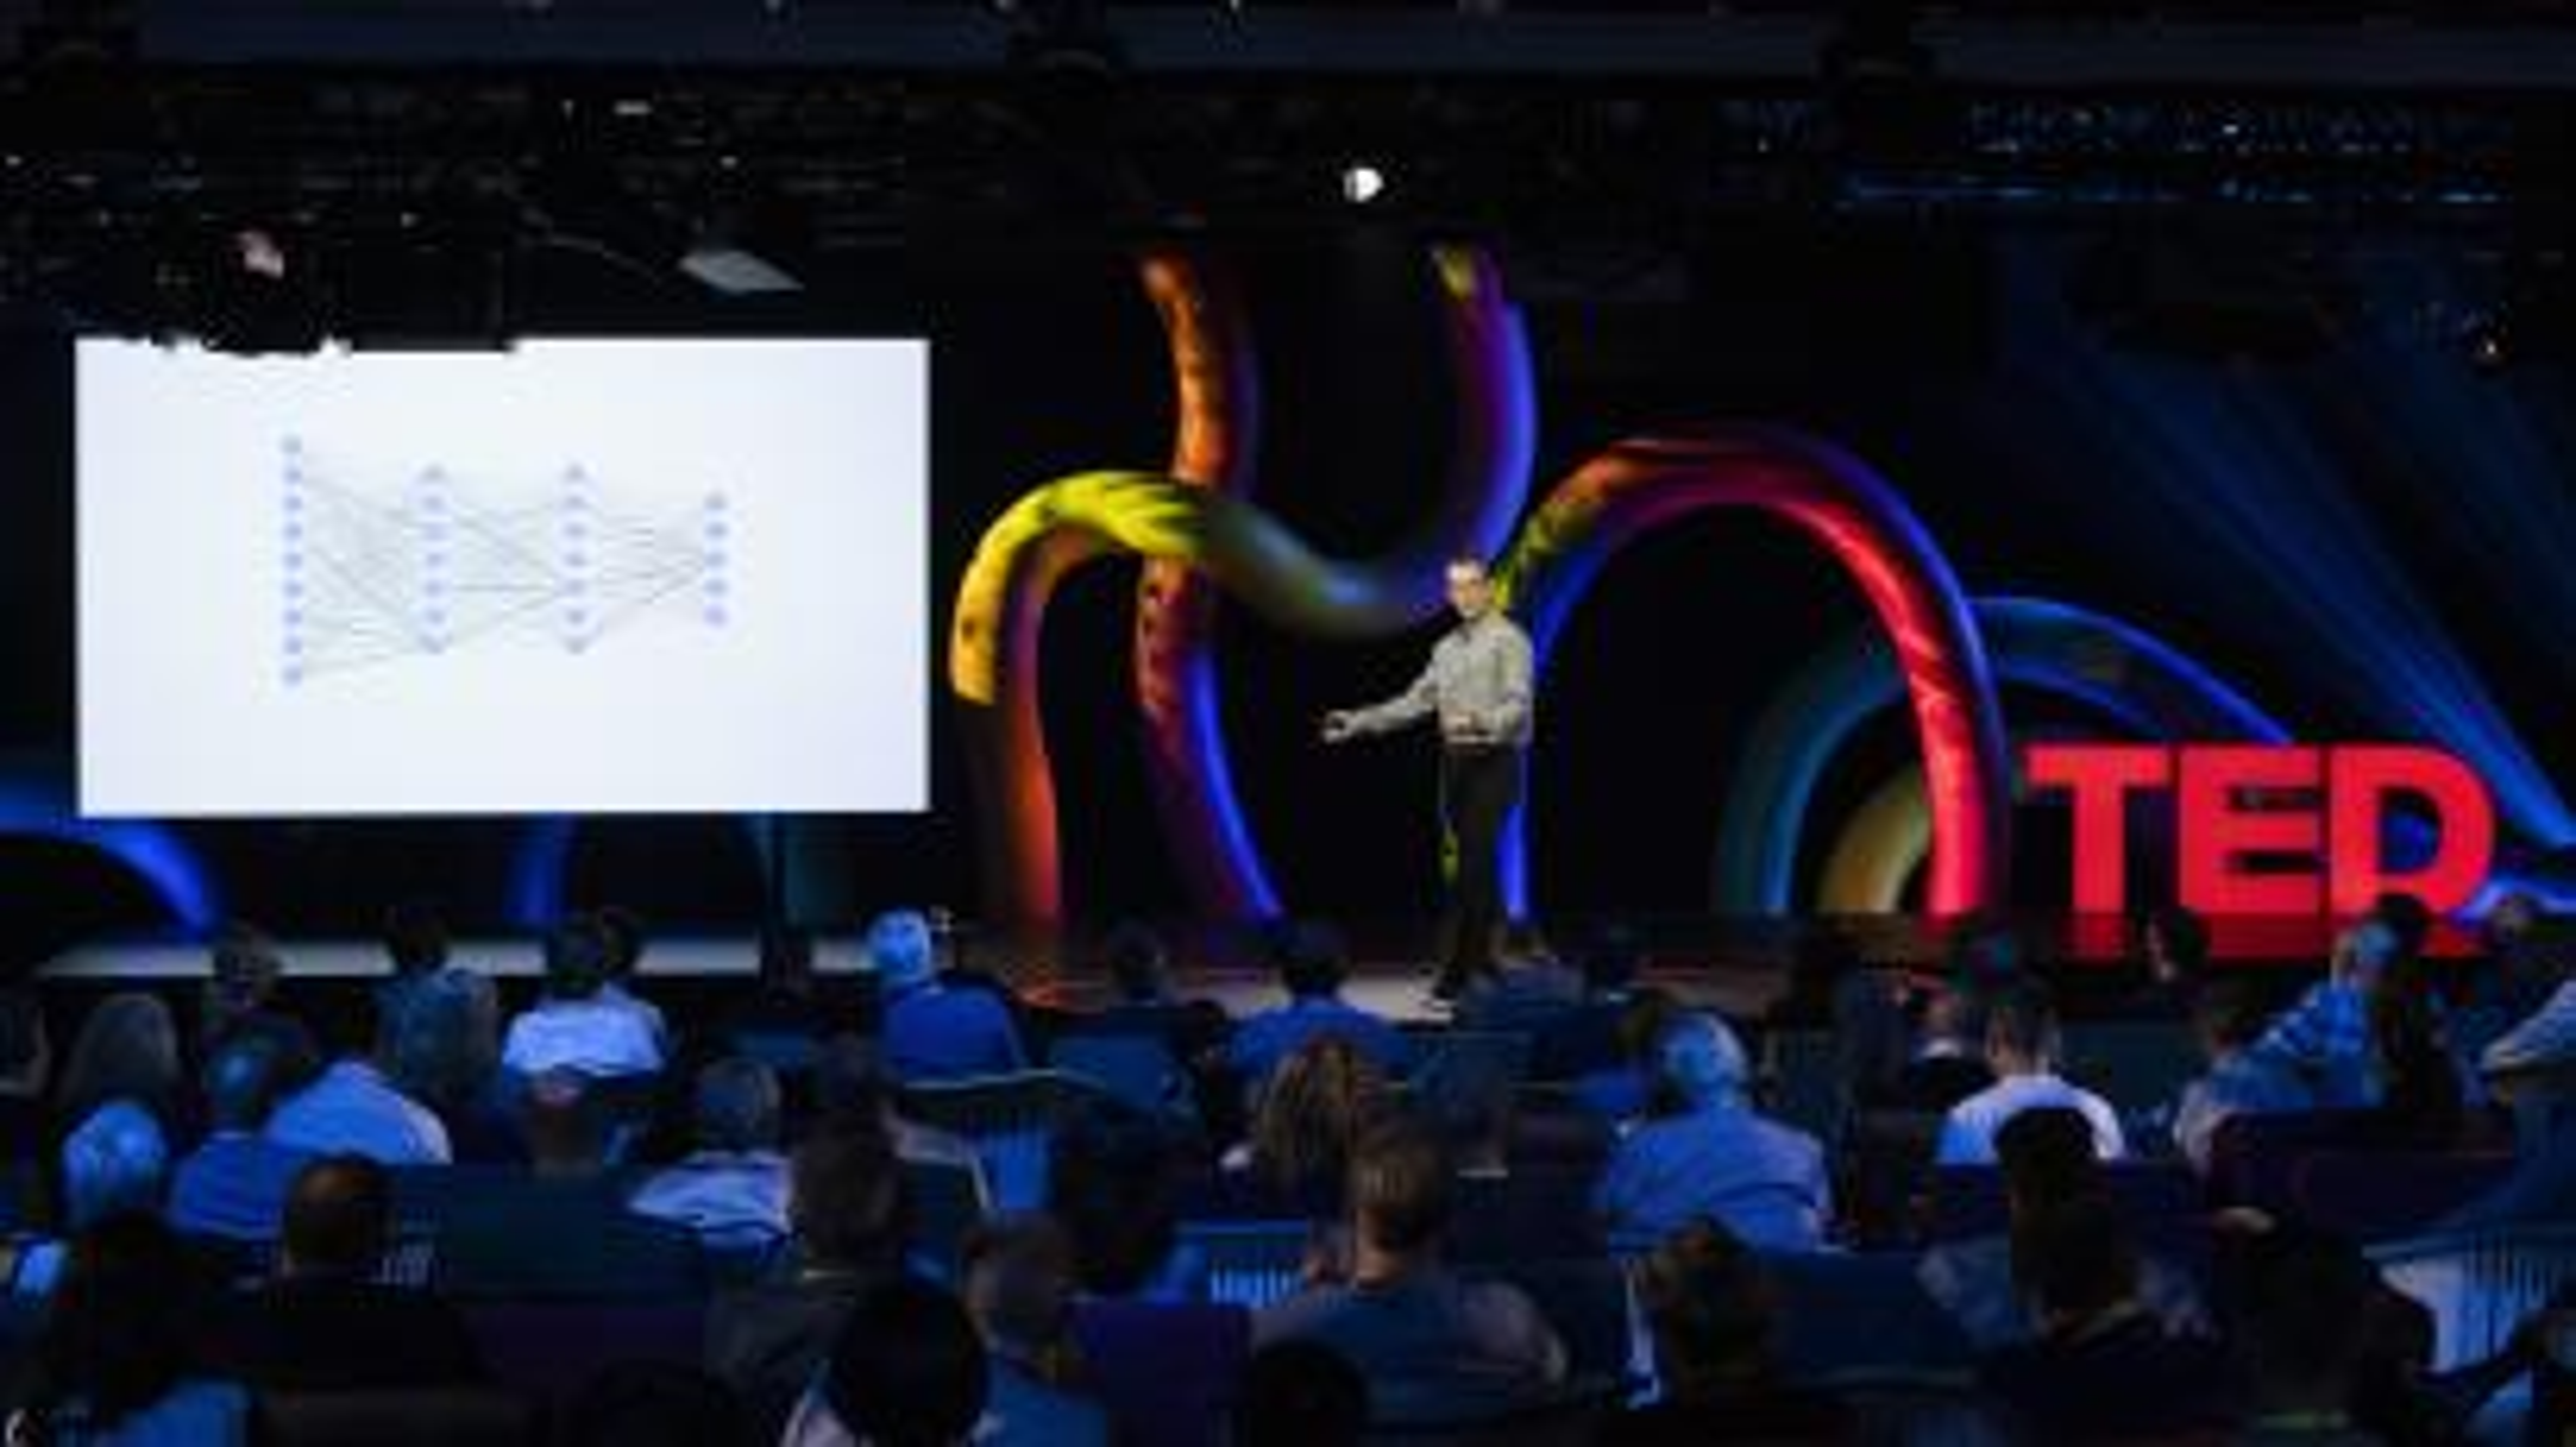 Jeff Dean speaks at TEDMonterey on August 3, 2021. TEDMonterey: The Case for Optimism. August 1-4, 2021, Monterey, California. Photo: Ryan Lash / TED